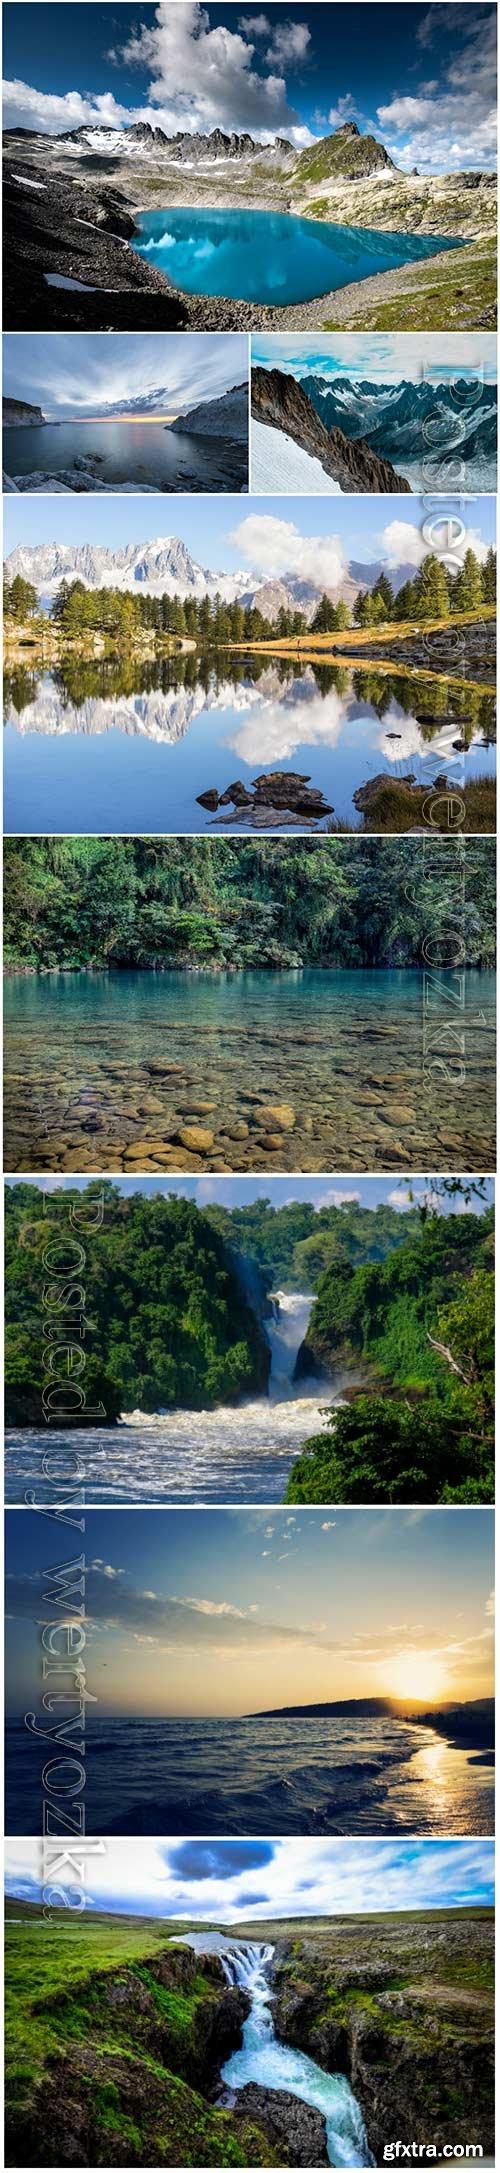 Beautiful nature, landscapes